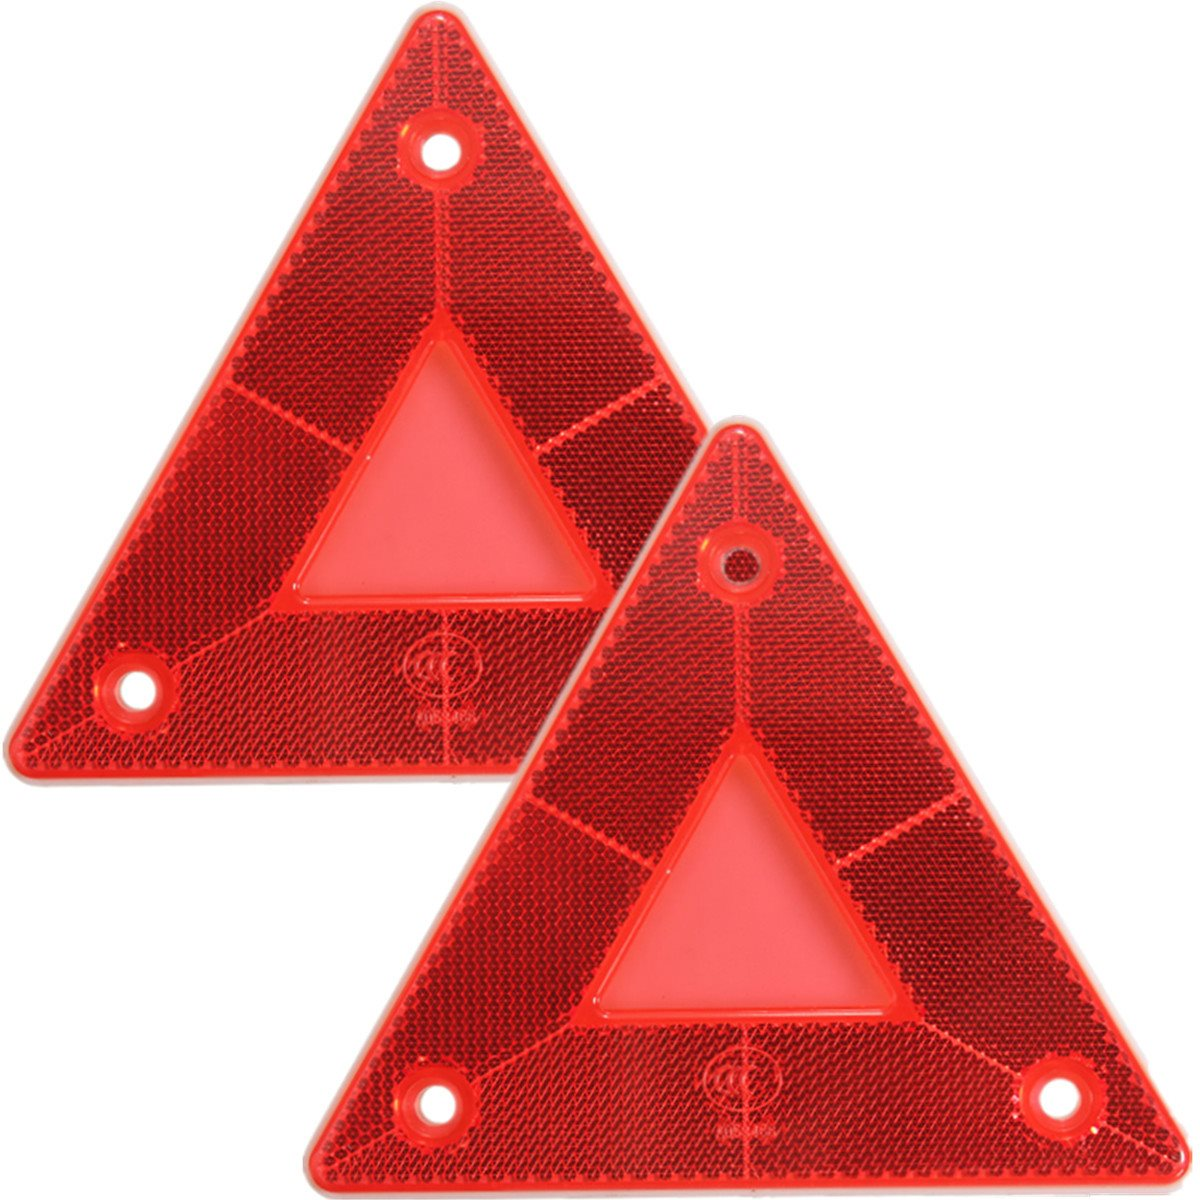 2Pcs Rear Light Car Truck Trailer Fire Triangle Reflector Safty Warning Board<br><br>Aliexpress